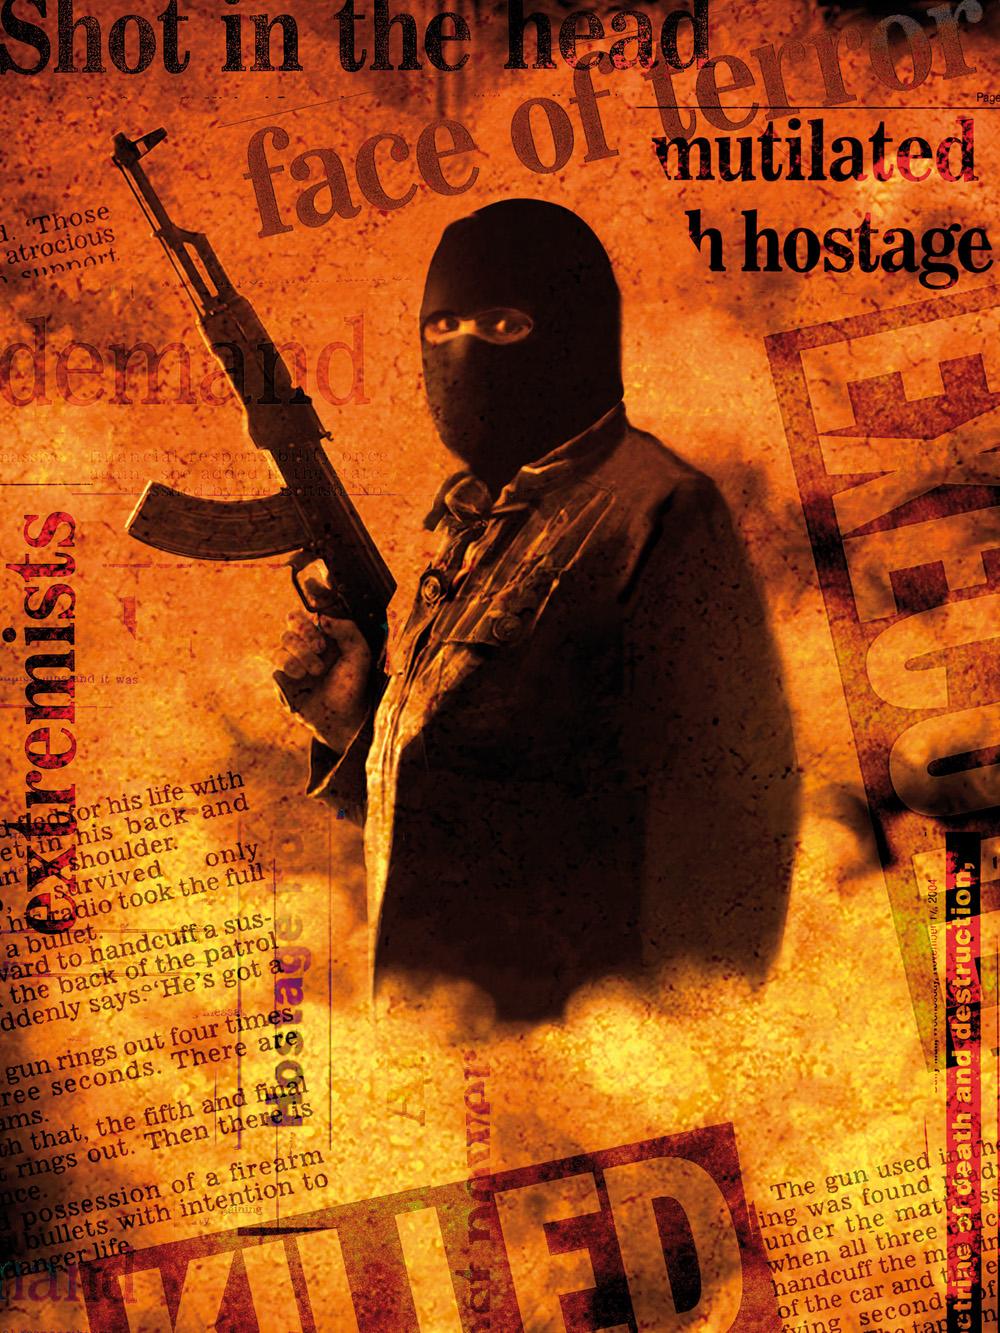 RCMP: Countering Violent Extremism program to prevent Radicalization